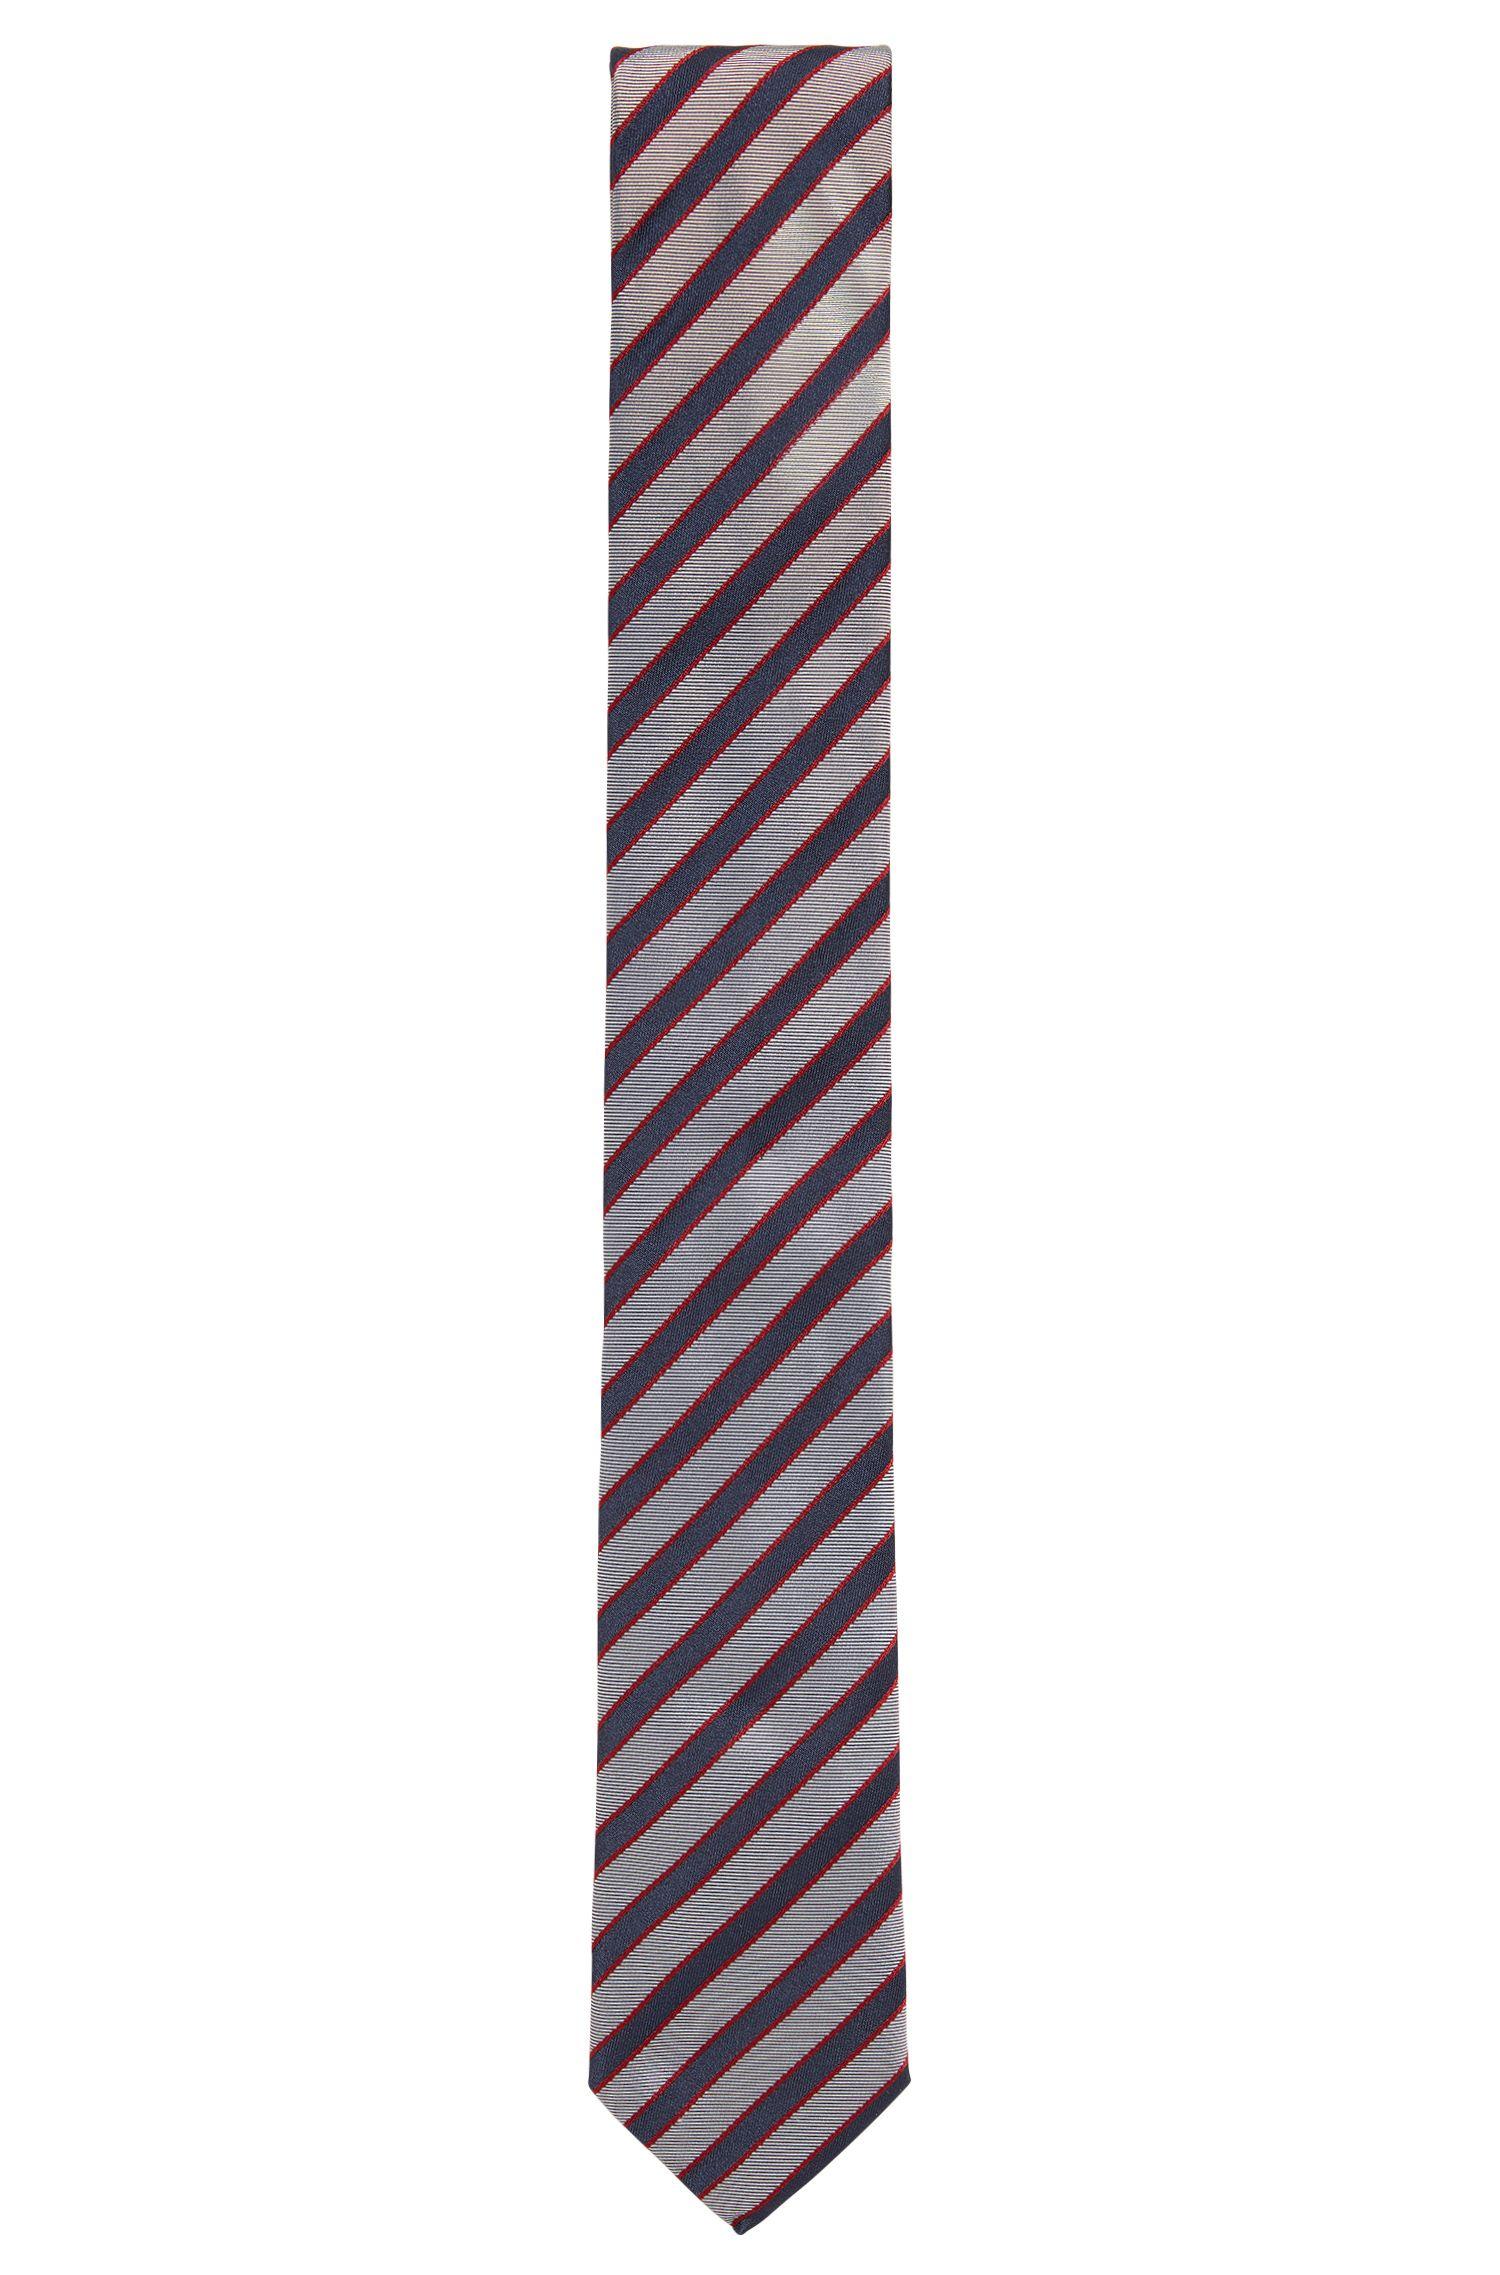 Silk jacquard tie with diagonal stripes